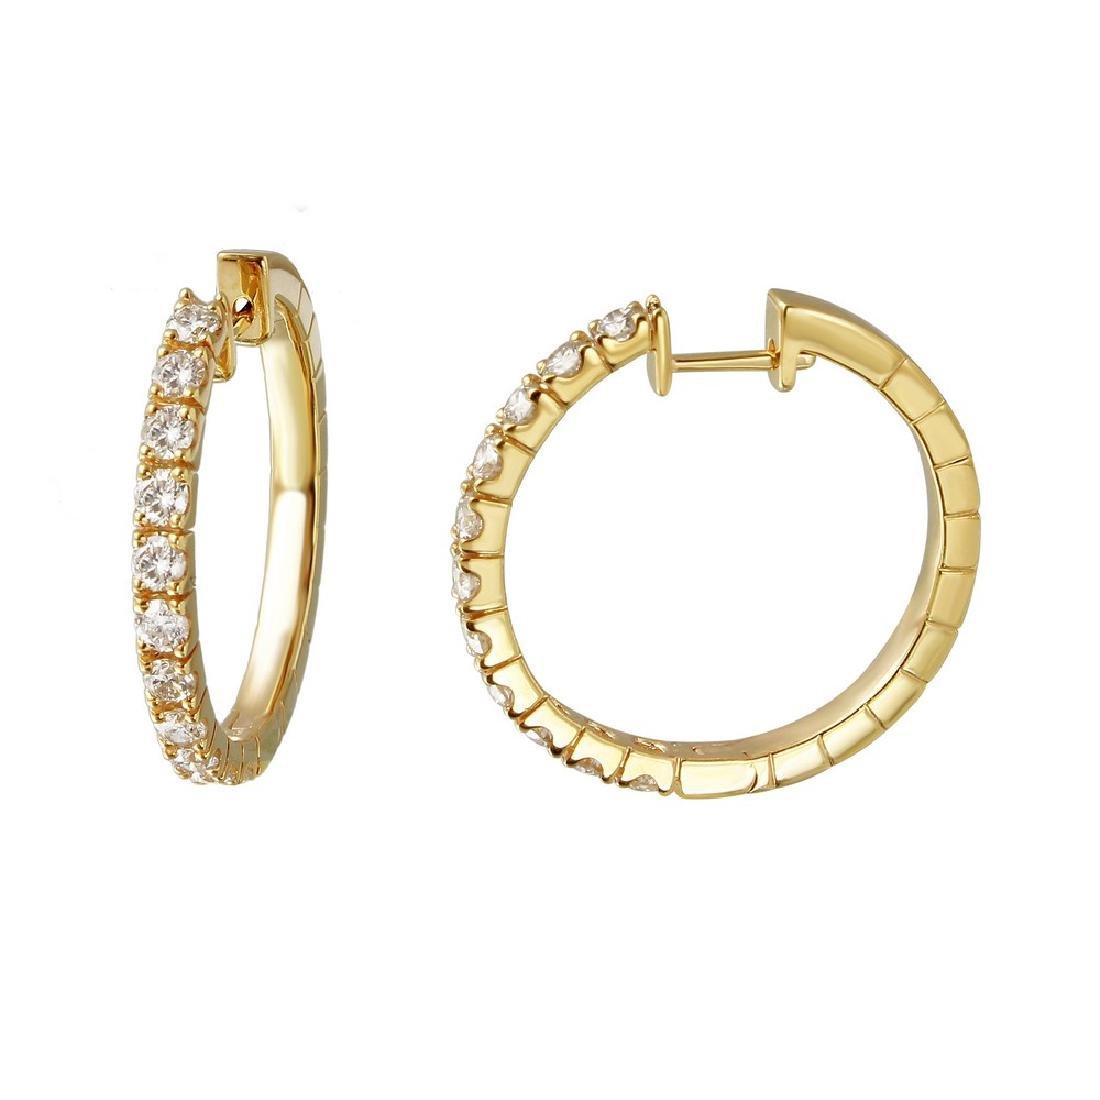 Genuine 1.77 TCW 14K Yellow Gold Ladies Earring